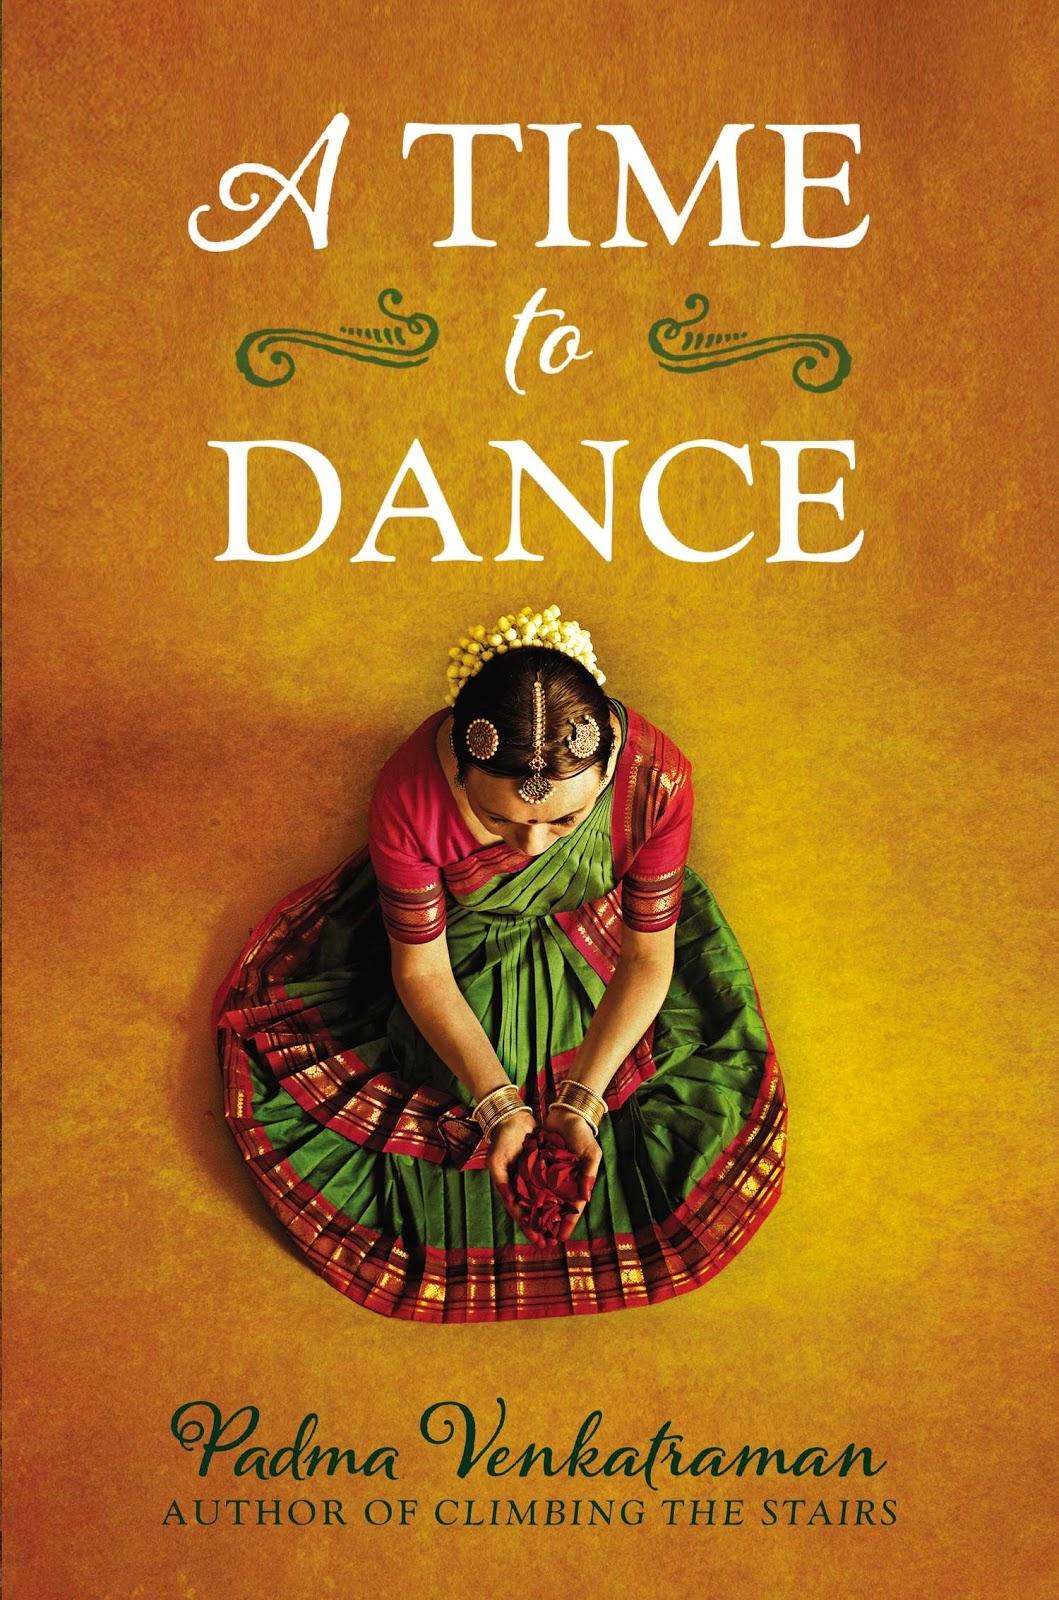 A Time To Dance (Padma Venkatraman)